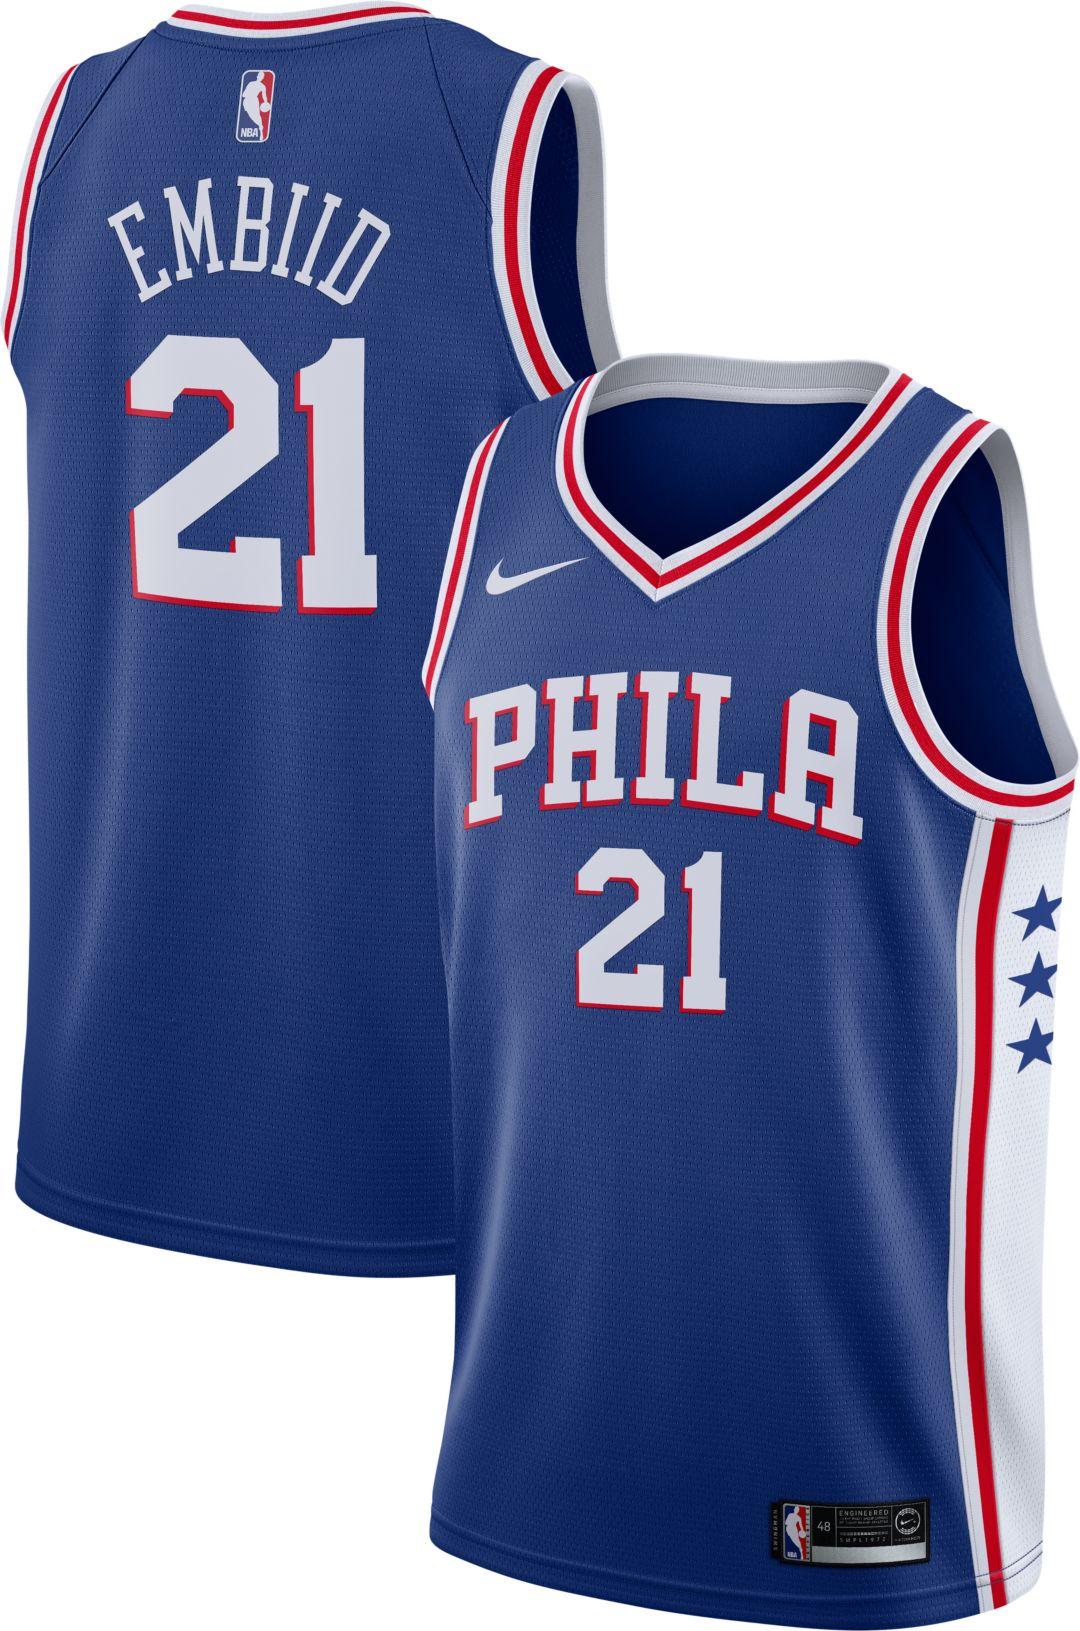 0b6acb101d9dd Nike Men's Philadelphia 76ers Joel Embiid #21 Royal Dri-FIT Swingman Jersey